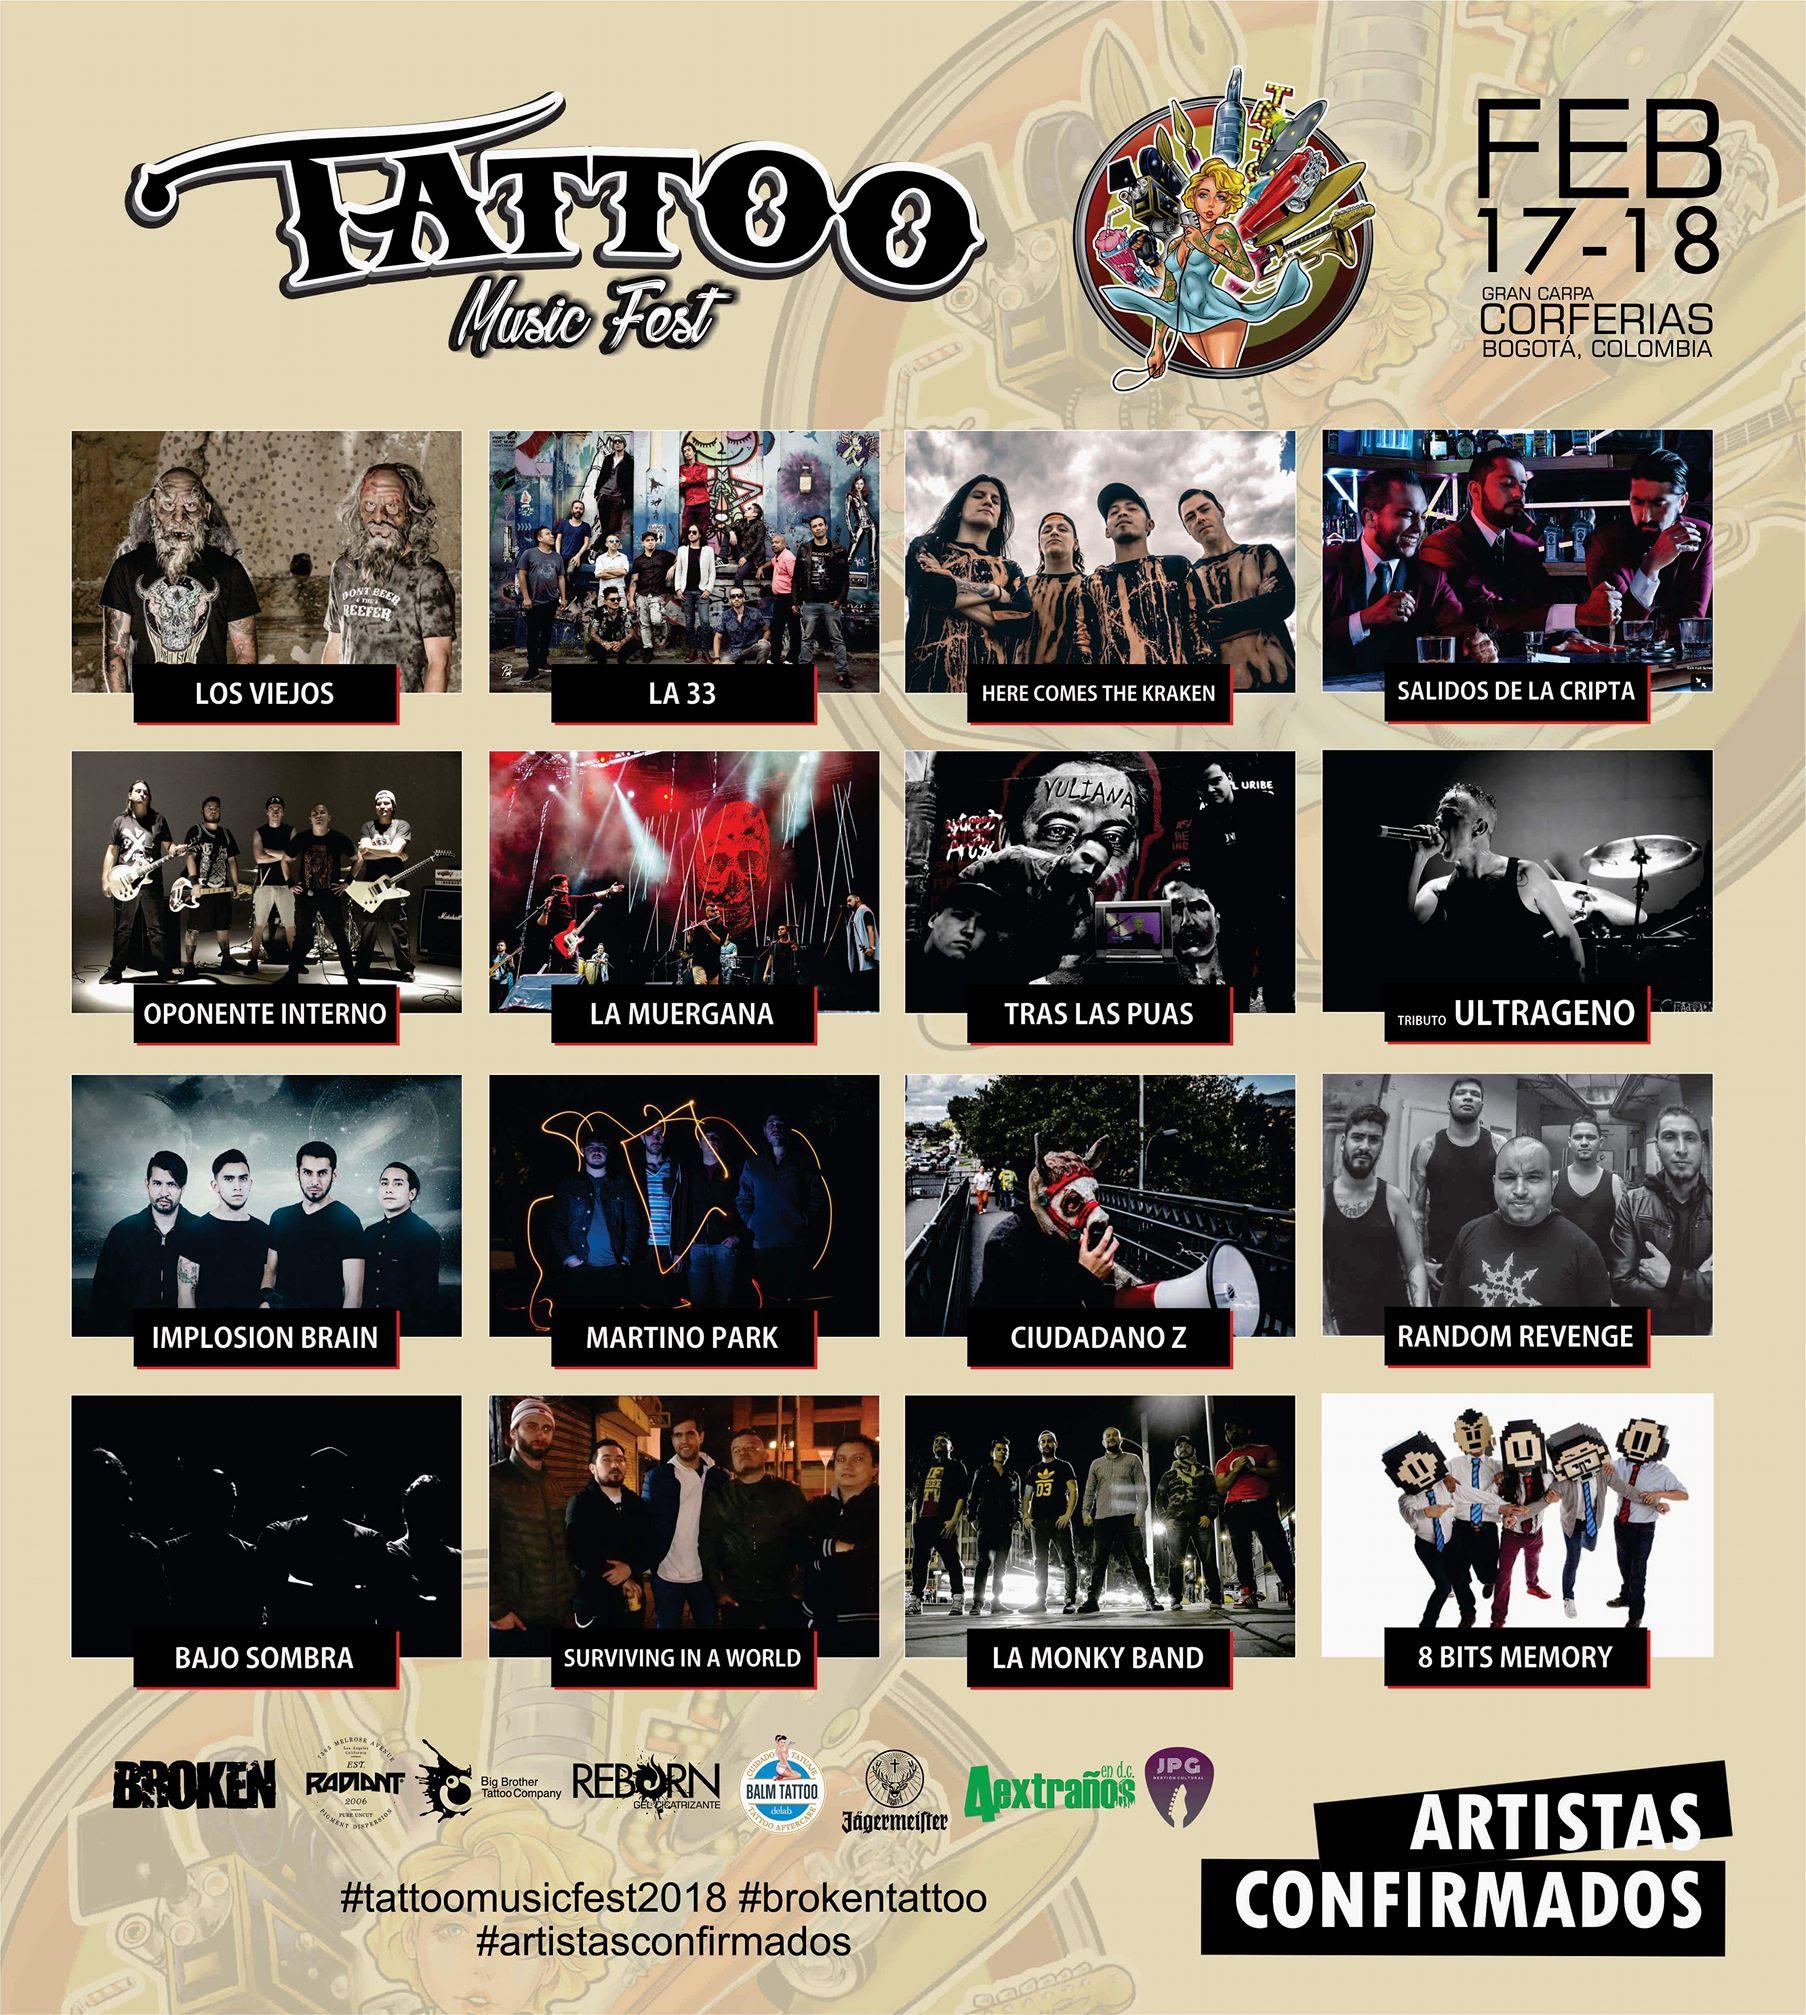 TATTOO MUSIC FEST 2018 MAS QUE UN FESTIVAL